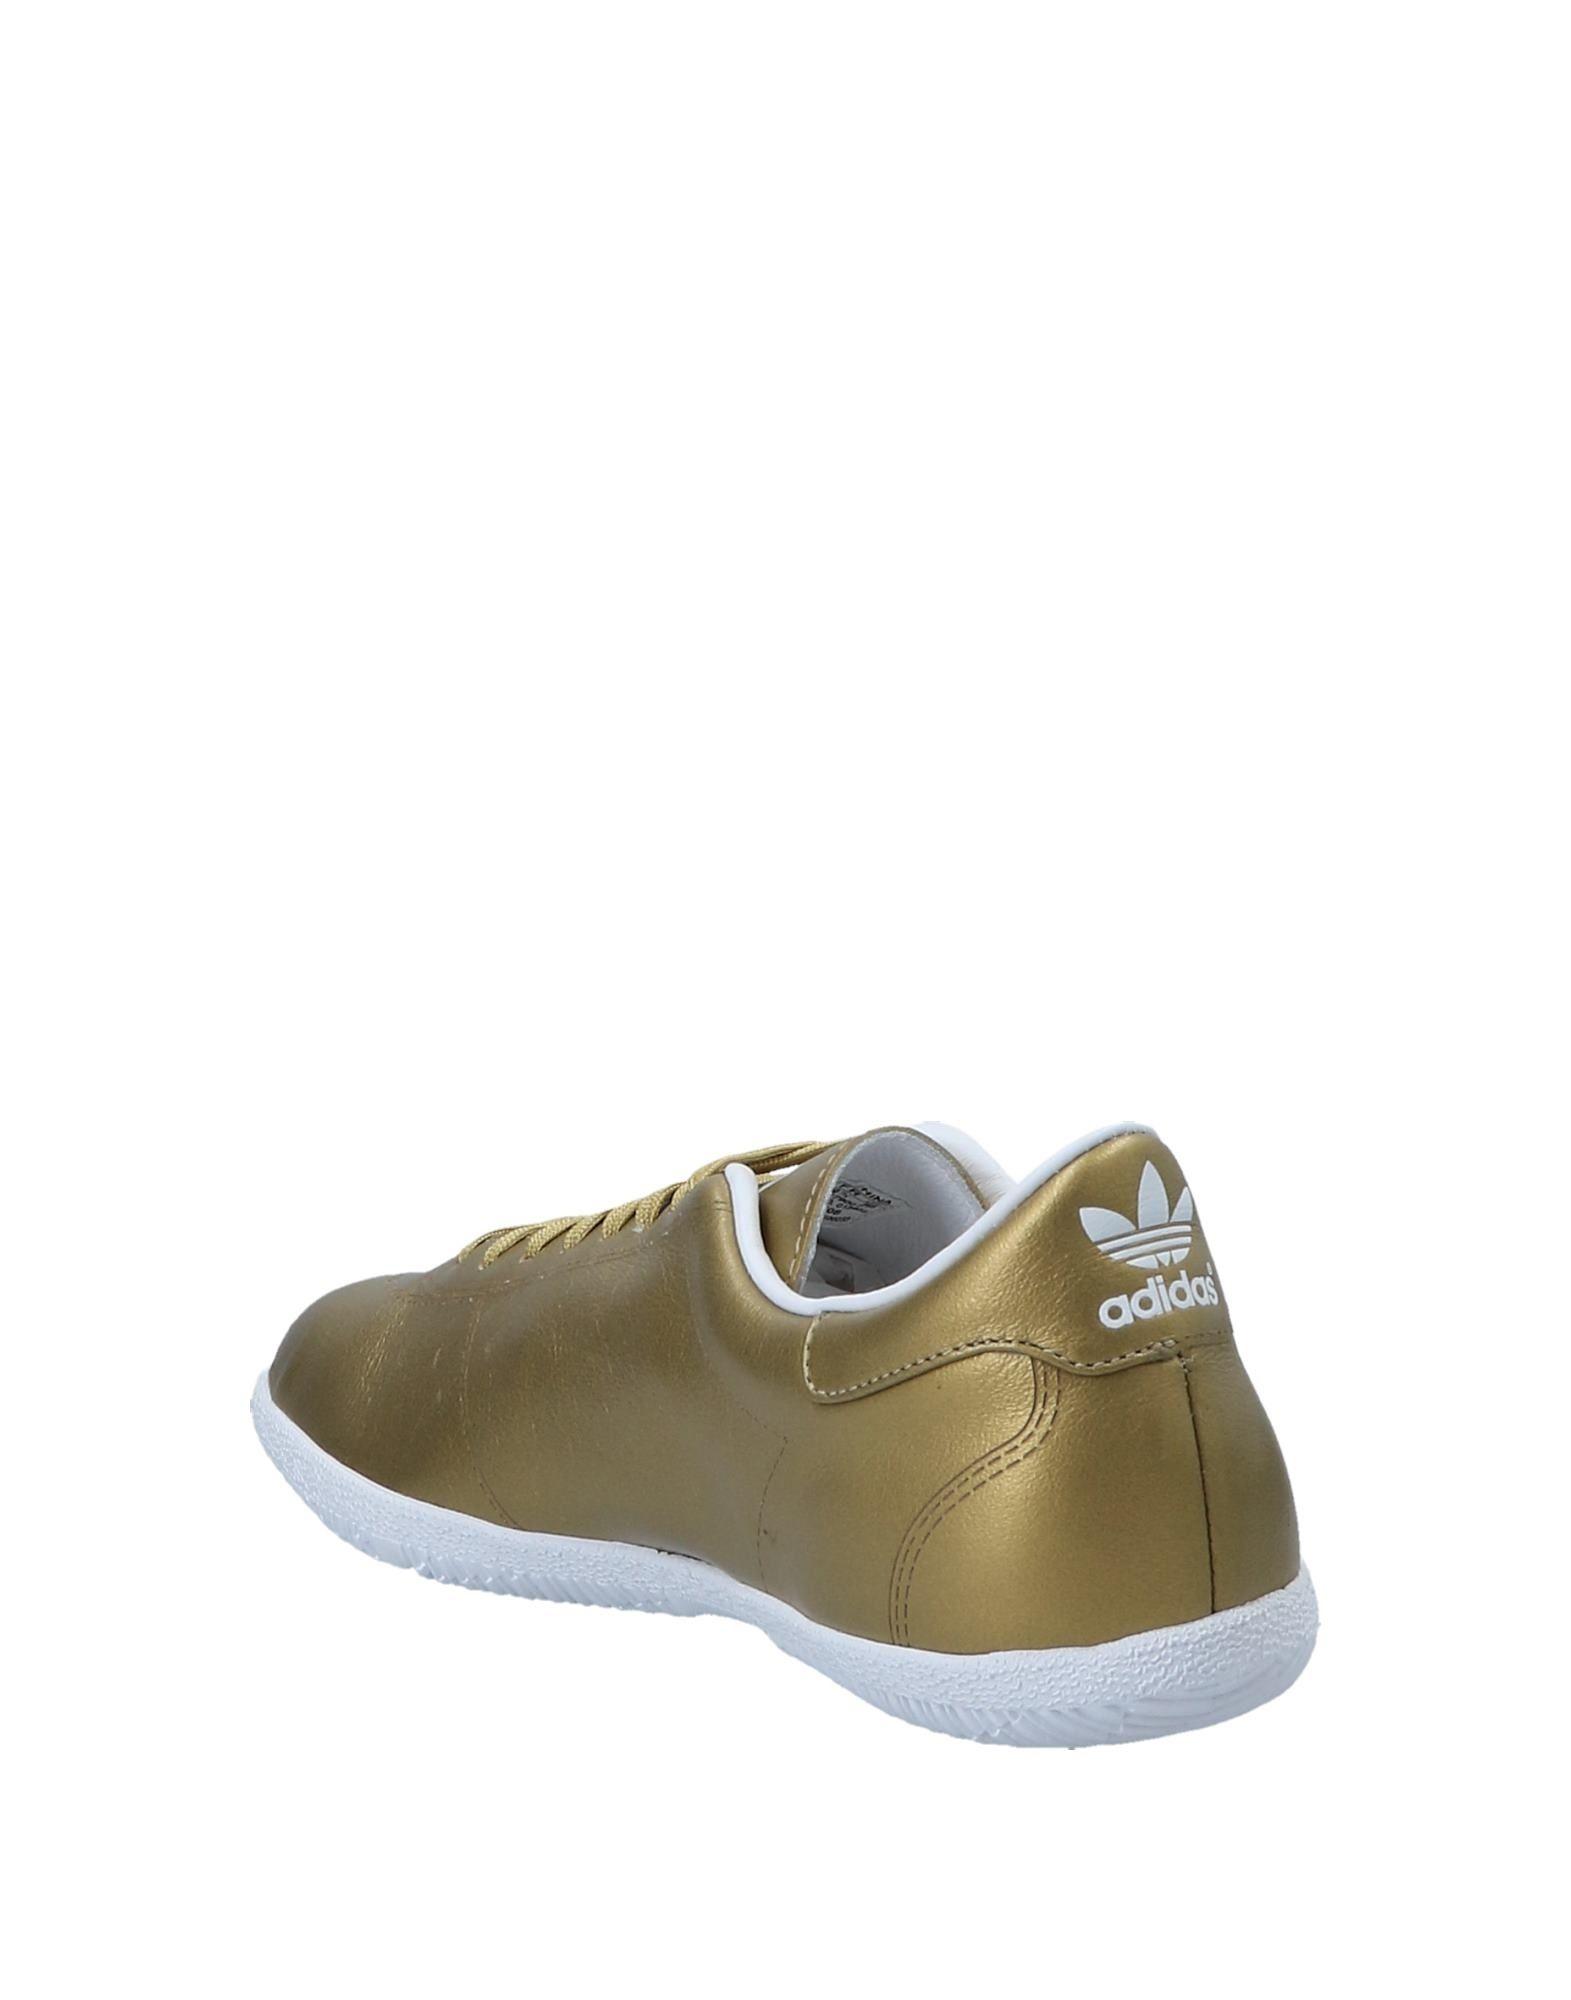 Adidas Originals Turnschuhes Qualität Damen 11556633OE Gute Qualität Turnschuhes beliebte Schuhe afb93c